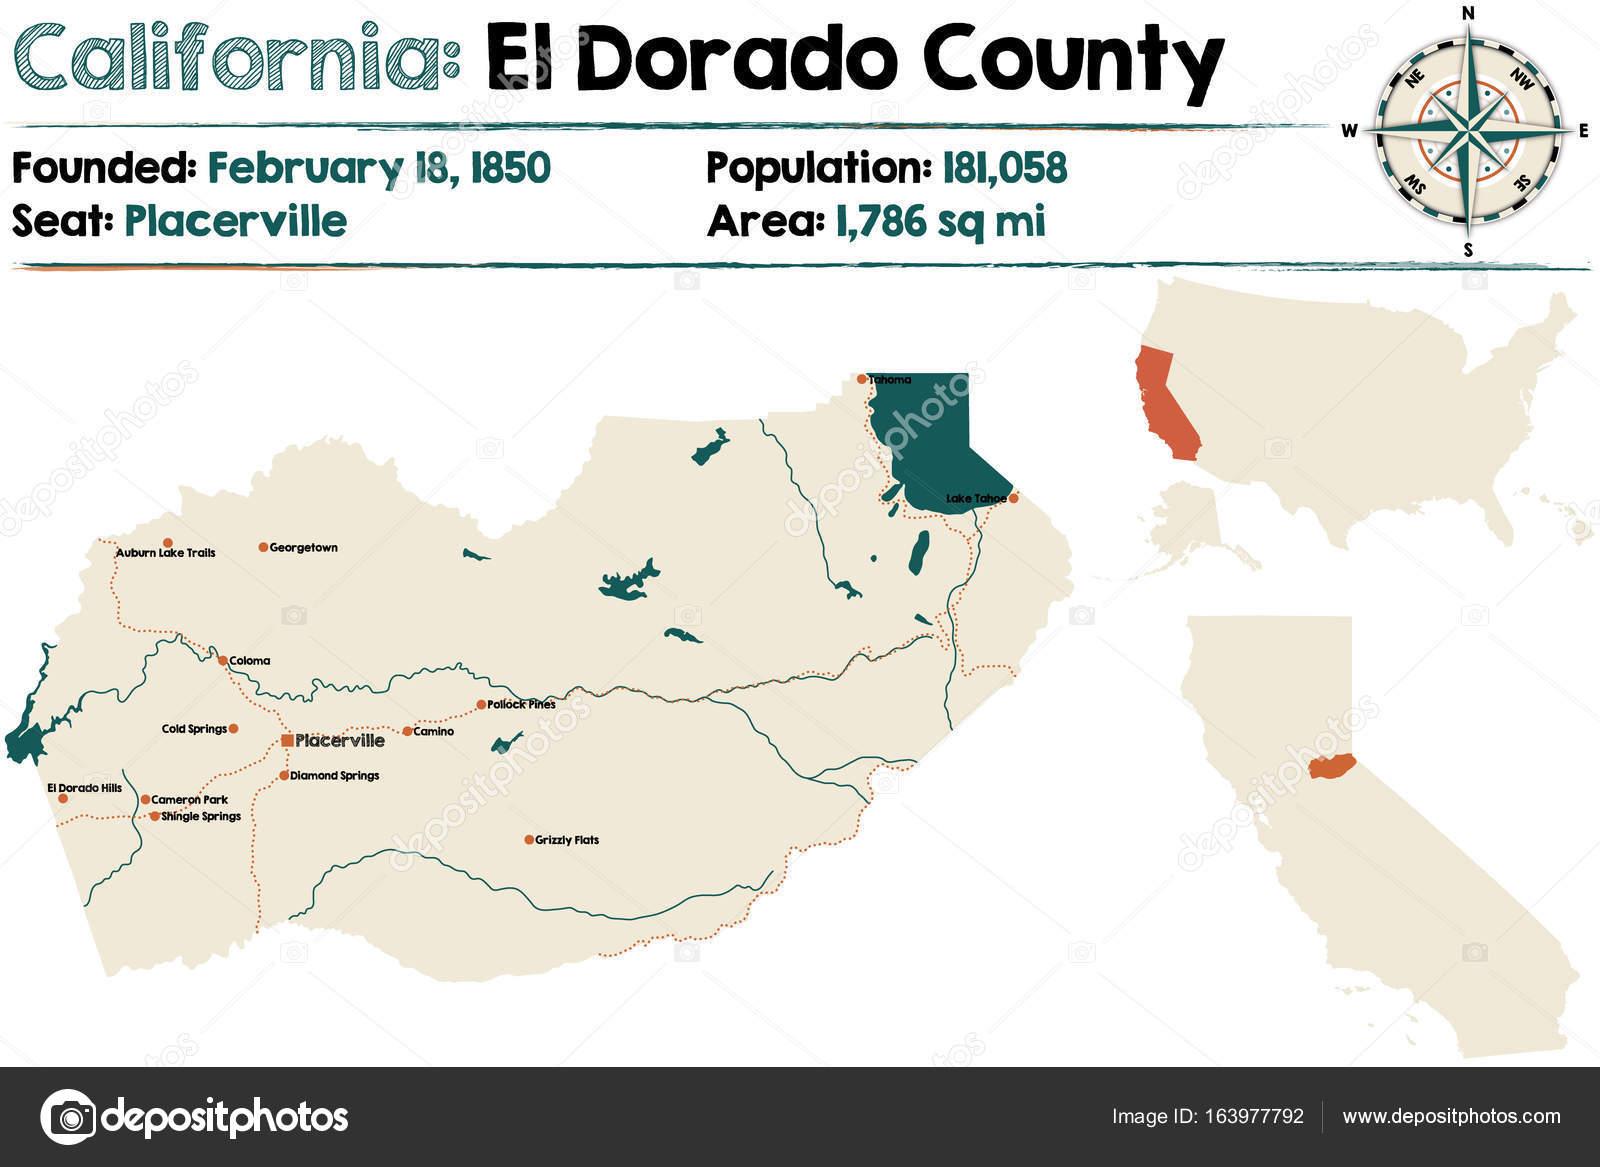 Kalifornien Karte.Kalifornien El Dorado County Karte Stockvektor Malachy666